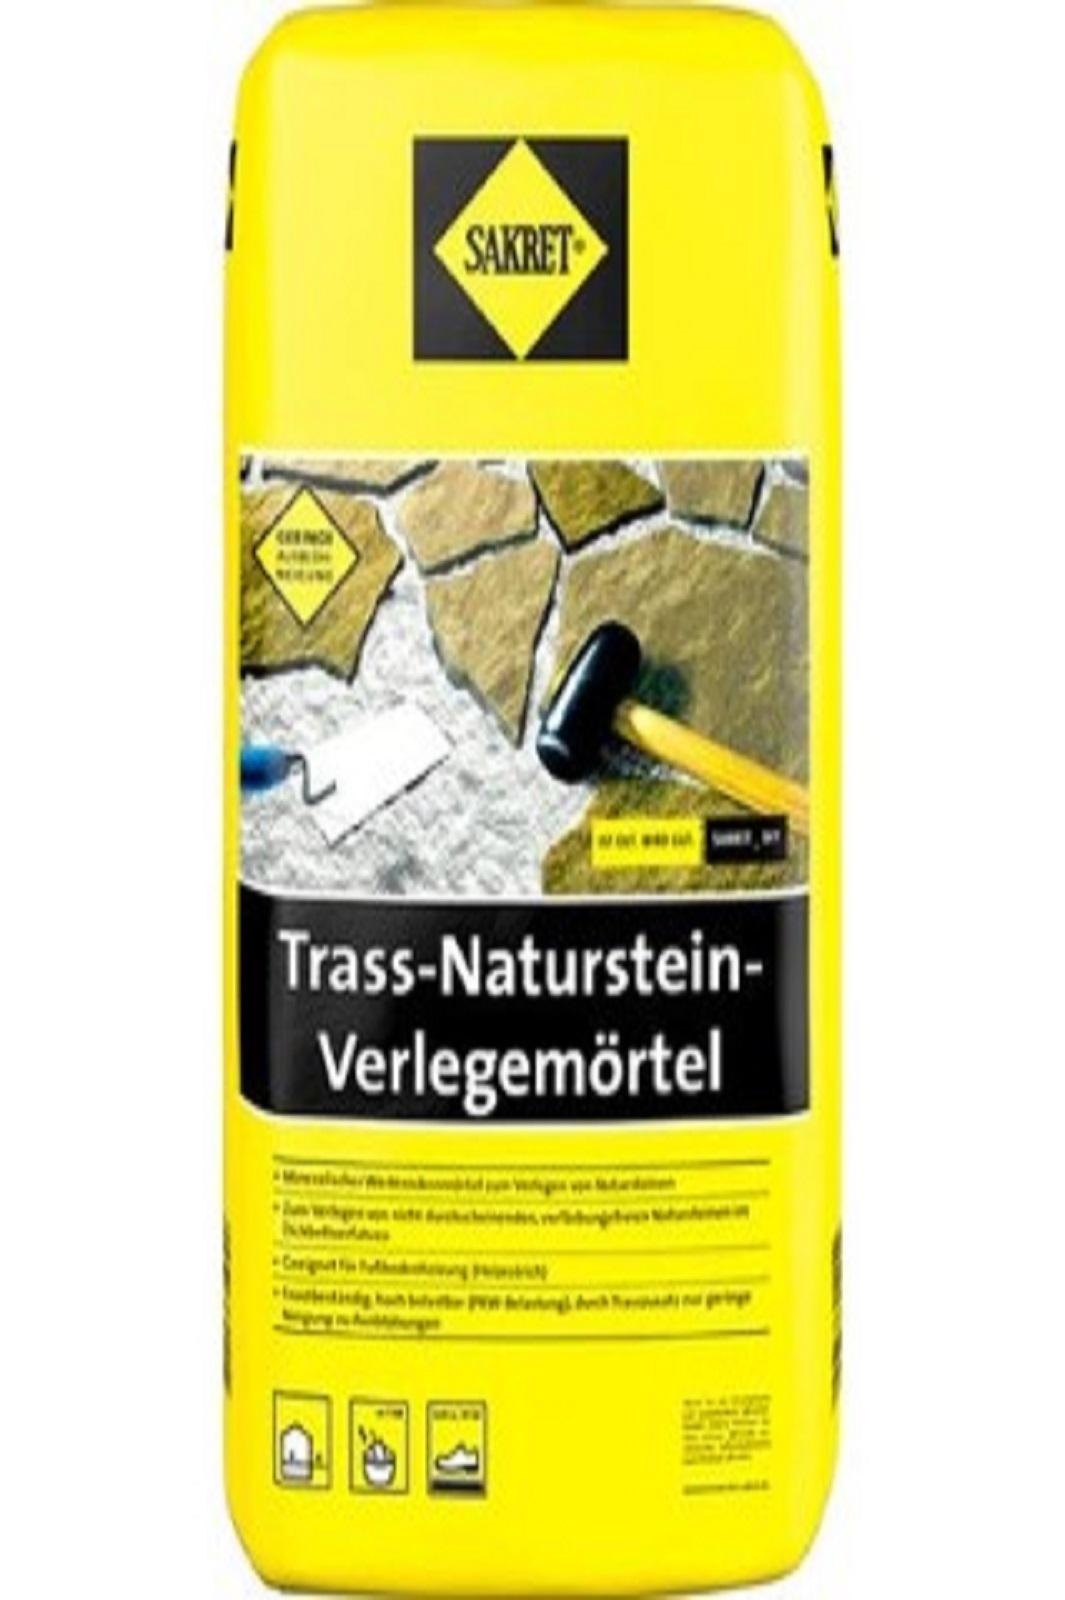 SAKRET Trassnaturstein-Verlegemörtel TNV 25kg